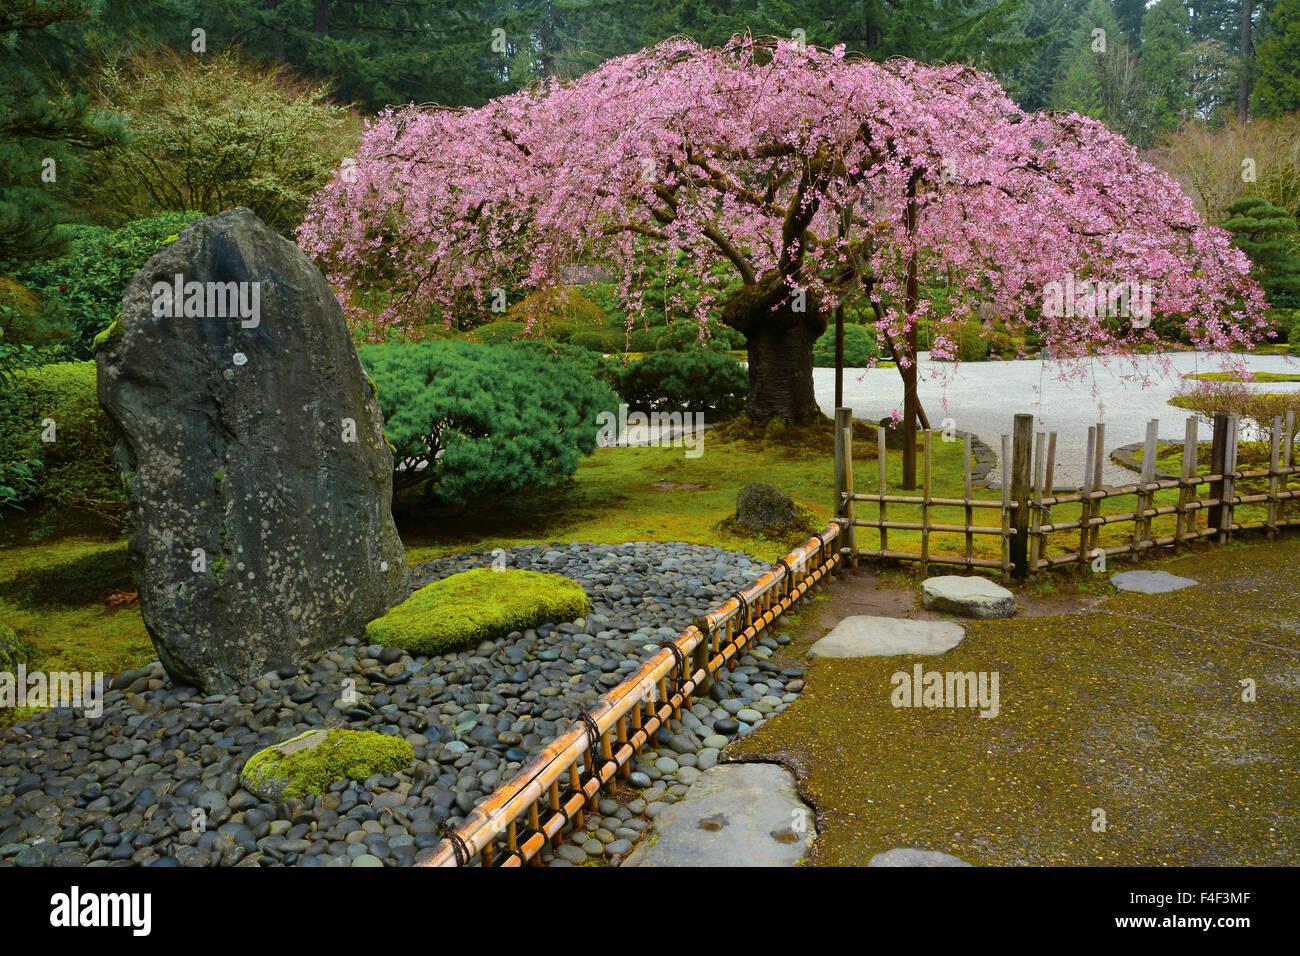 Weeping Cherry Flat Lat Garden Portland Japanese Garden Portland Stock Photo Royalty Free